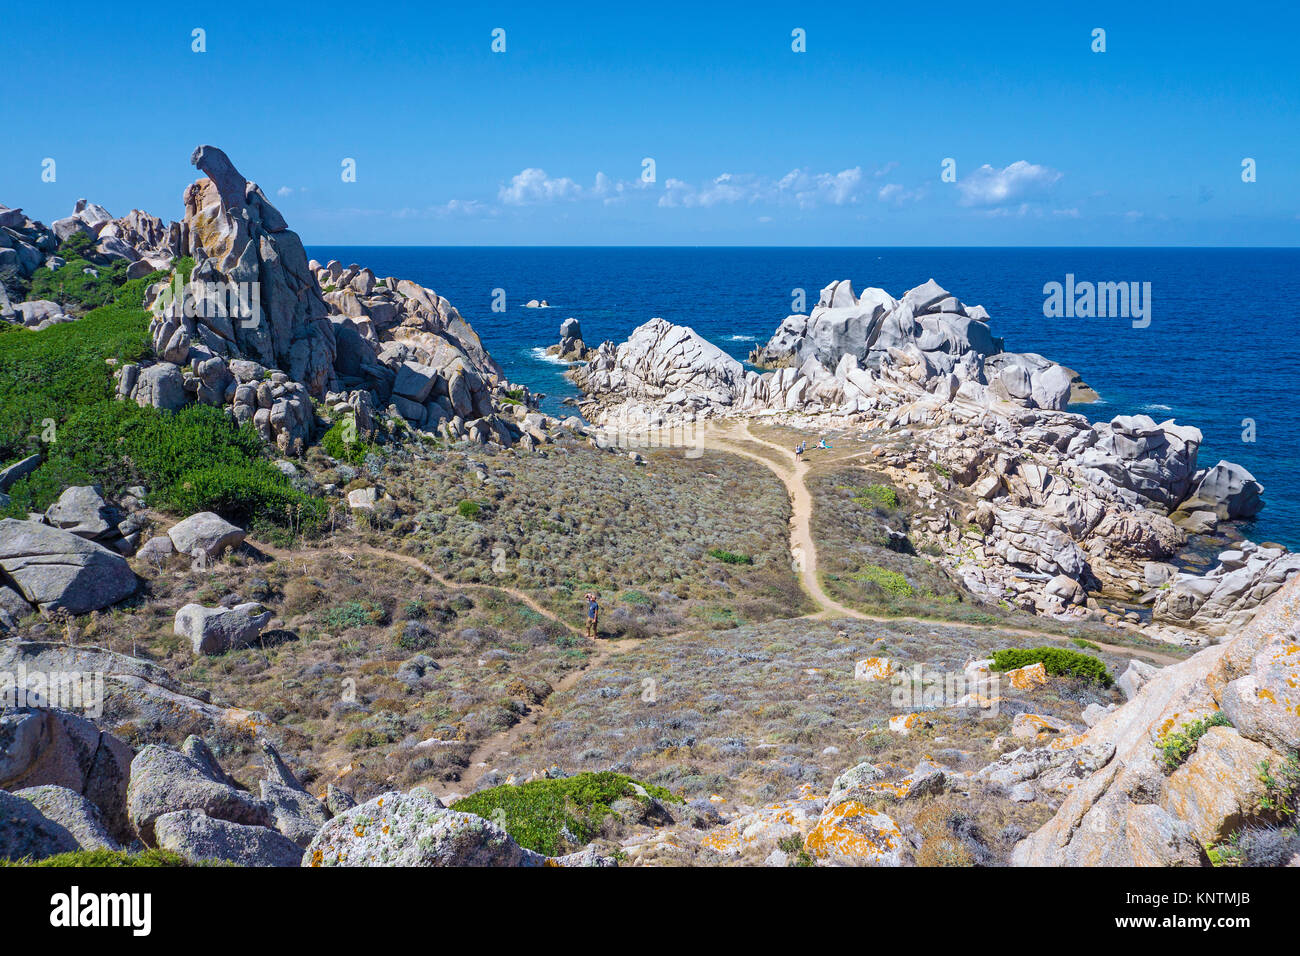 Coastal landscape, granite boulders at Capo Testa, Santa Teresa di Gallura, Sardinia, Italy, Mediterranean sea, - Stock Image